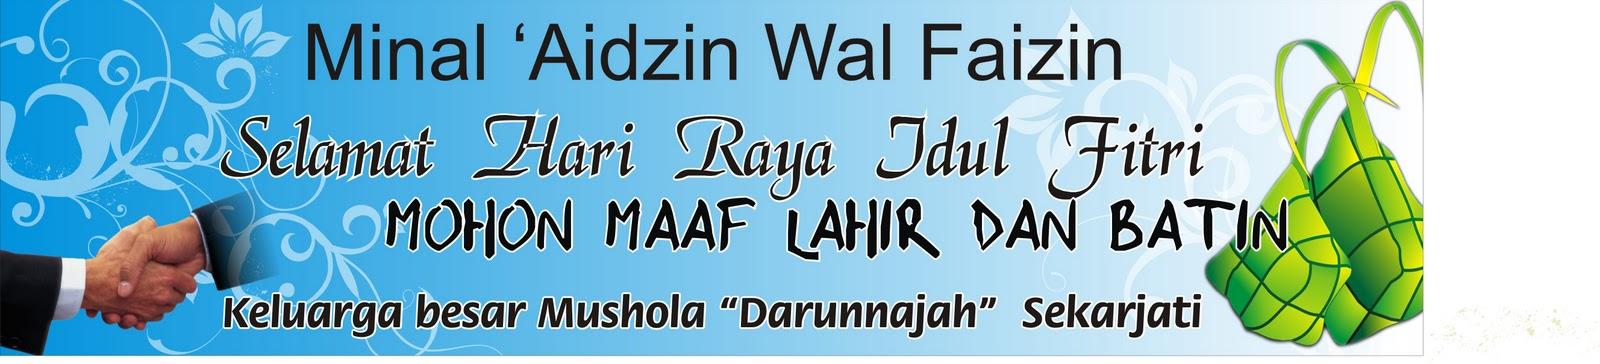 Spanduk Idul Fitri